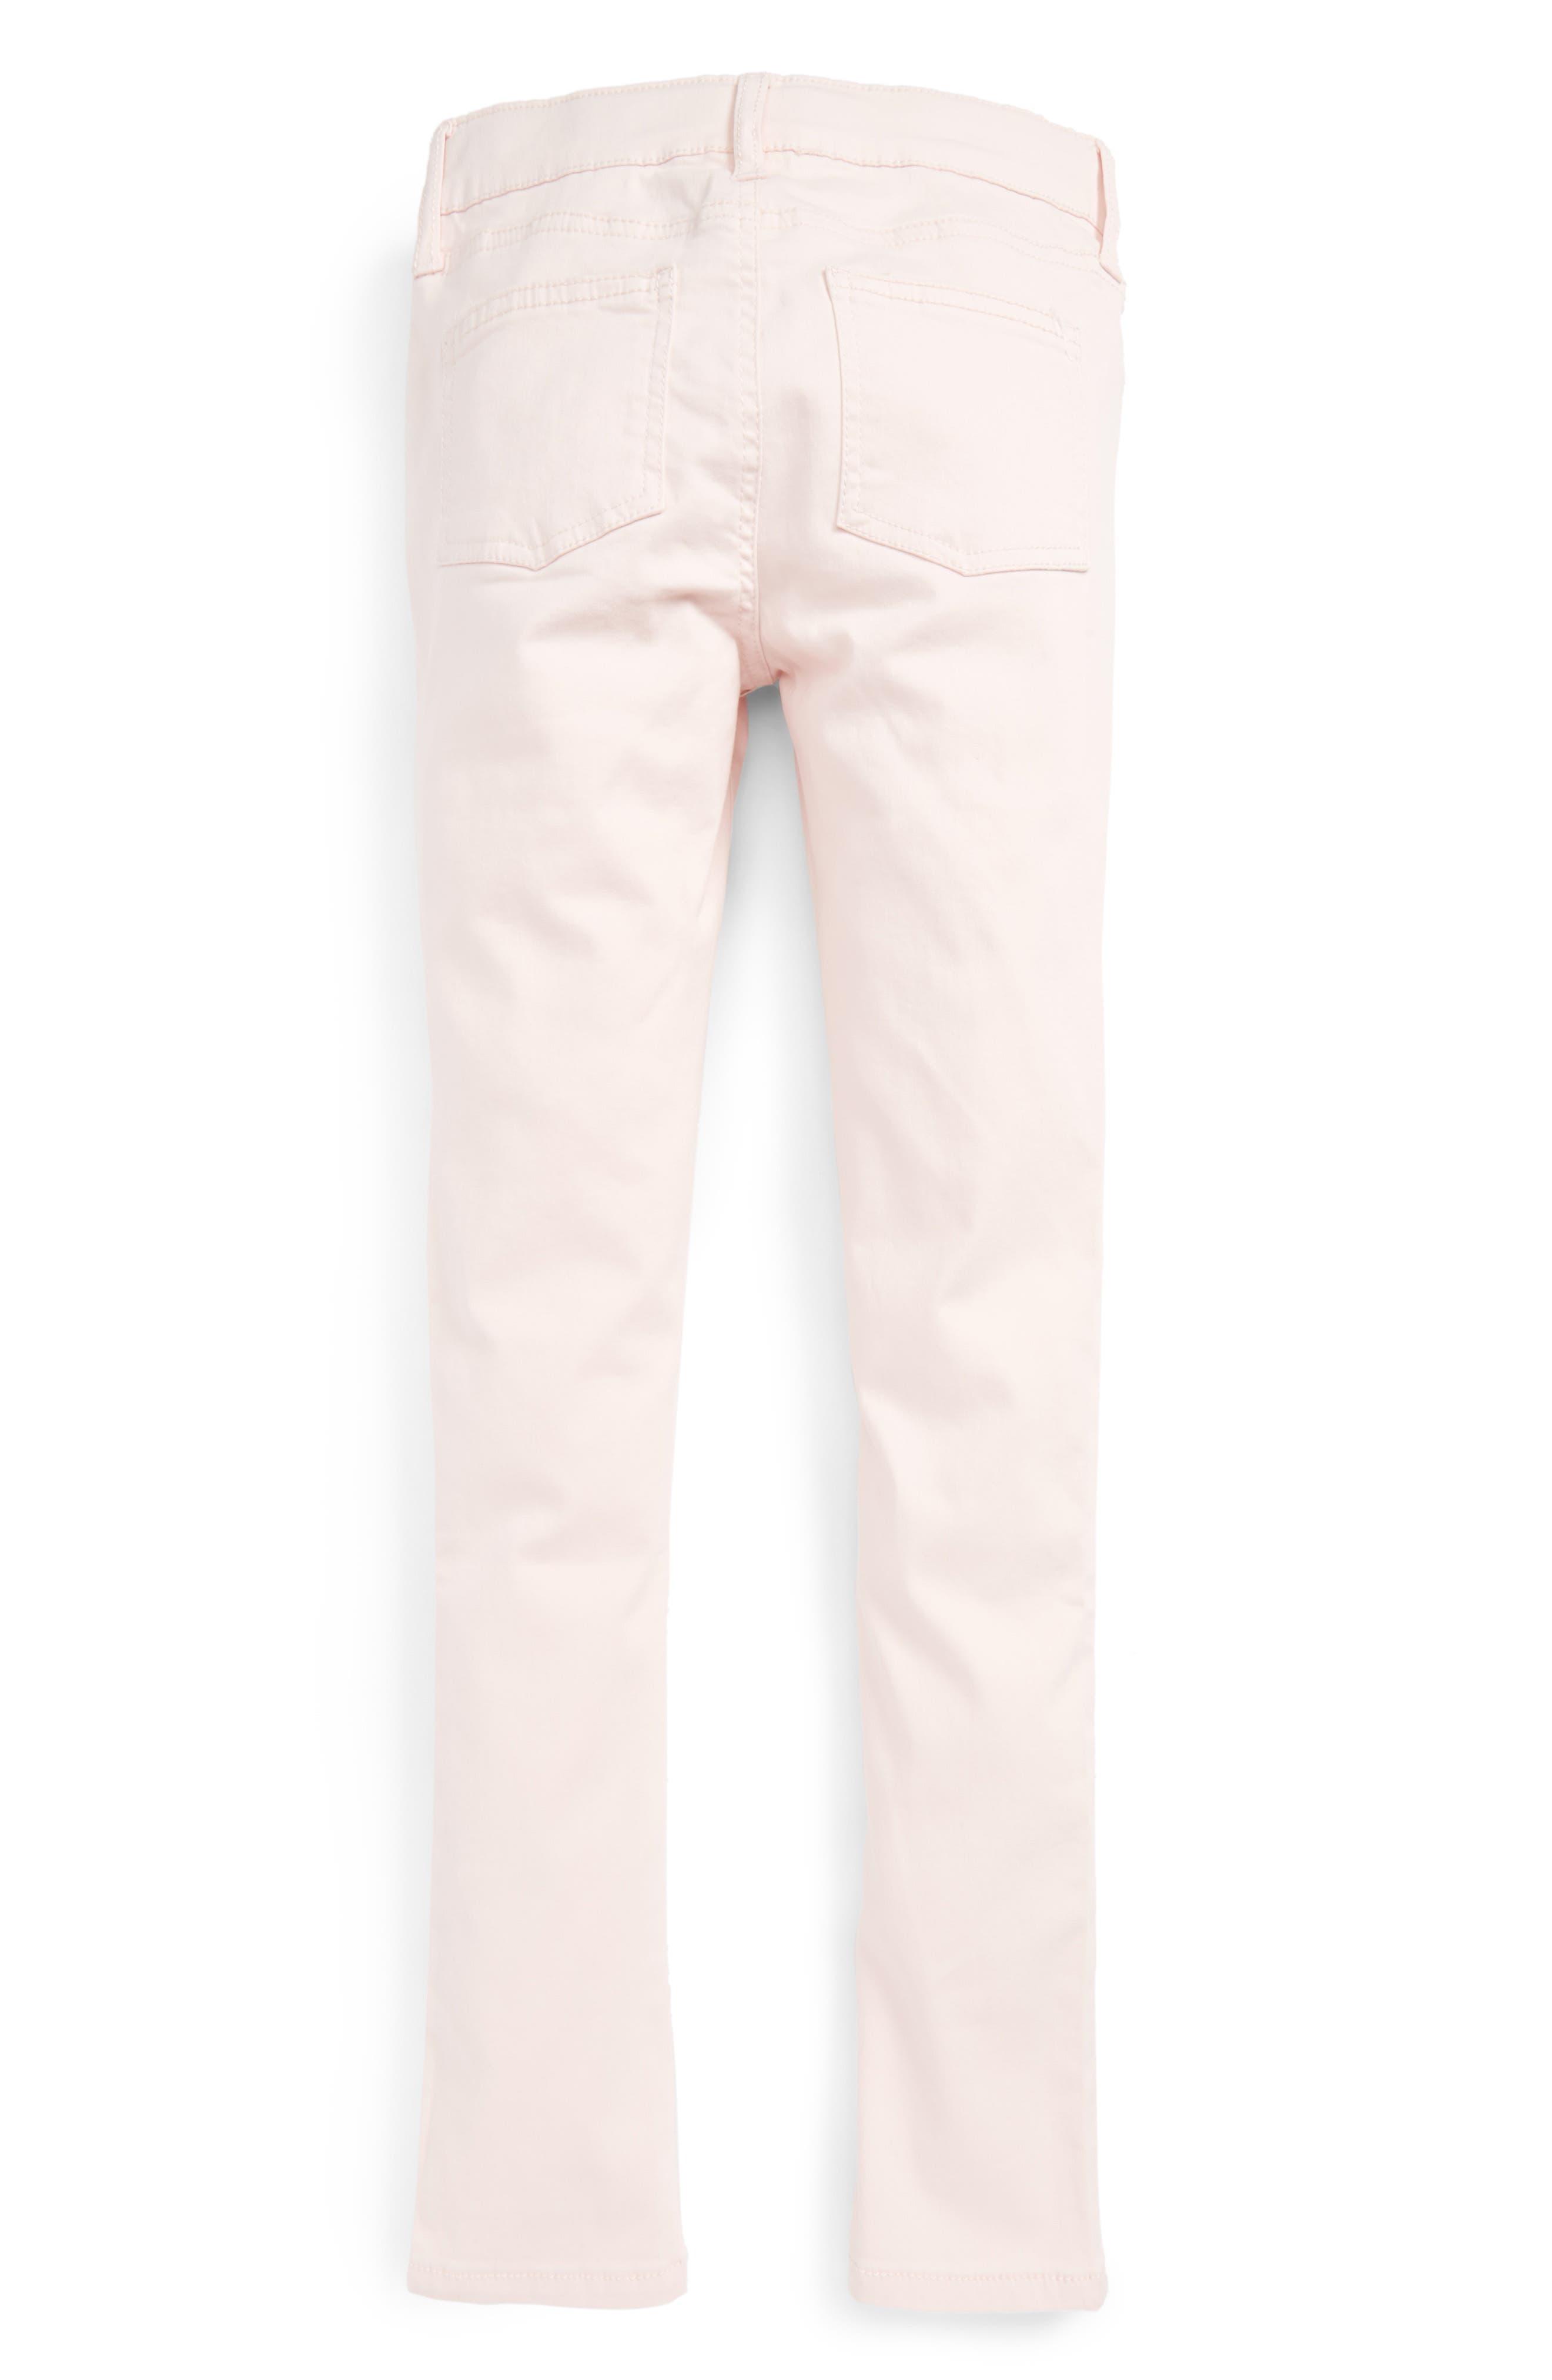 Taylor Skinny Jeans,                             Alternate thumbnail 2, color,                             682